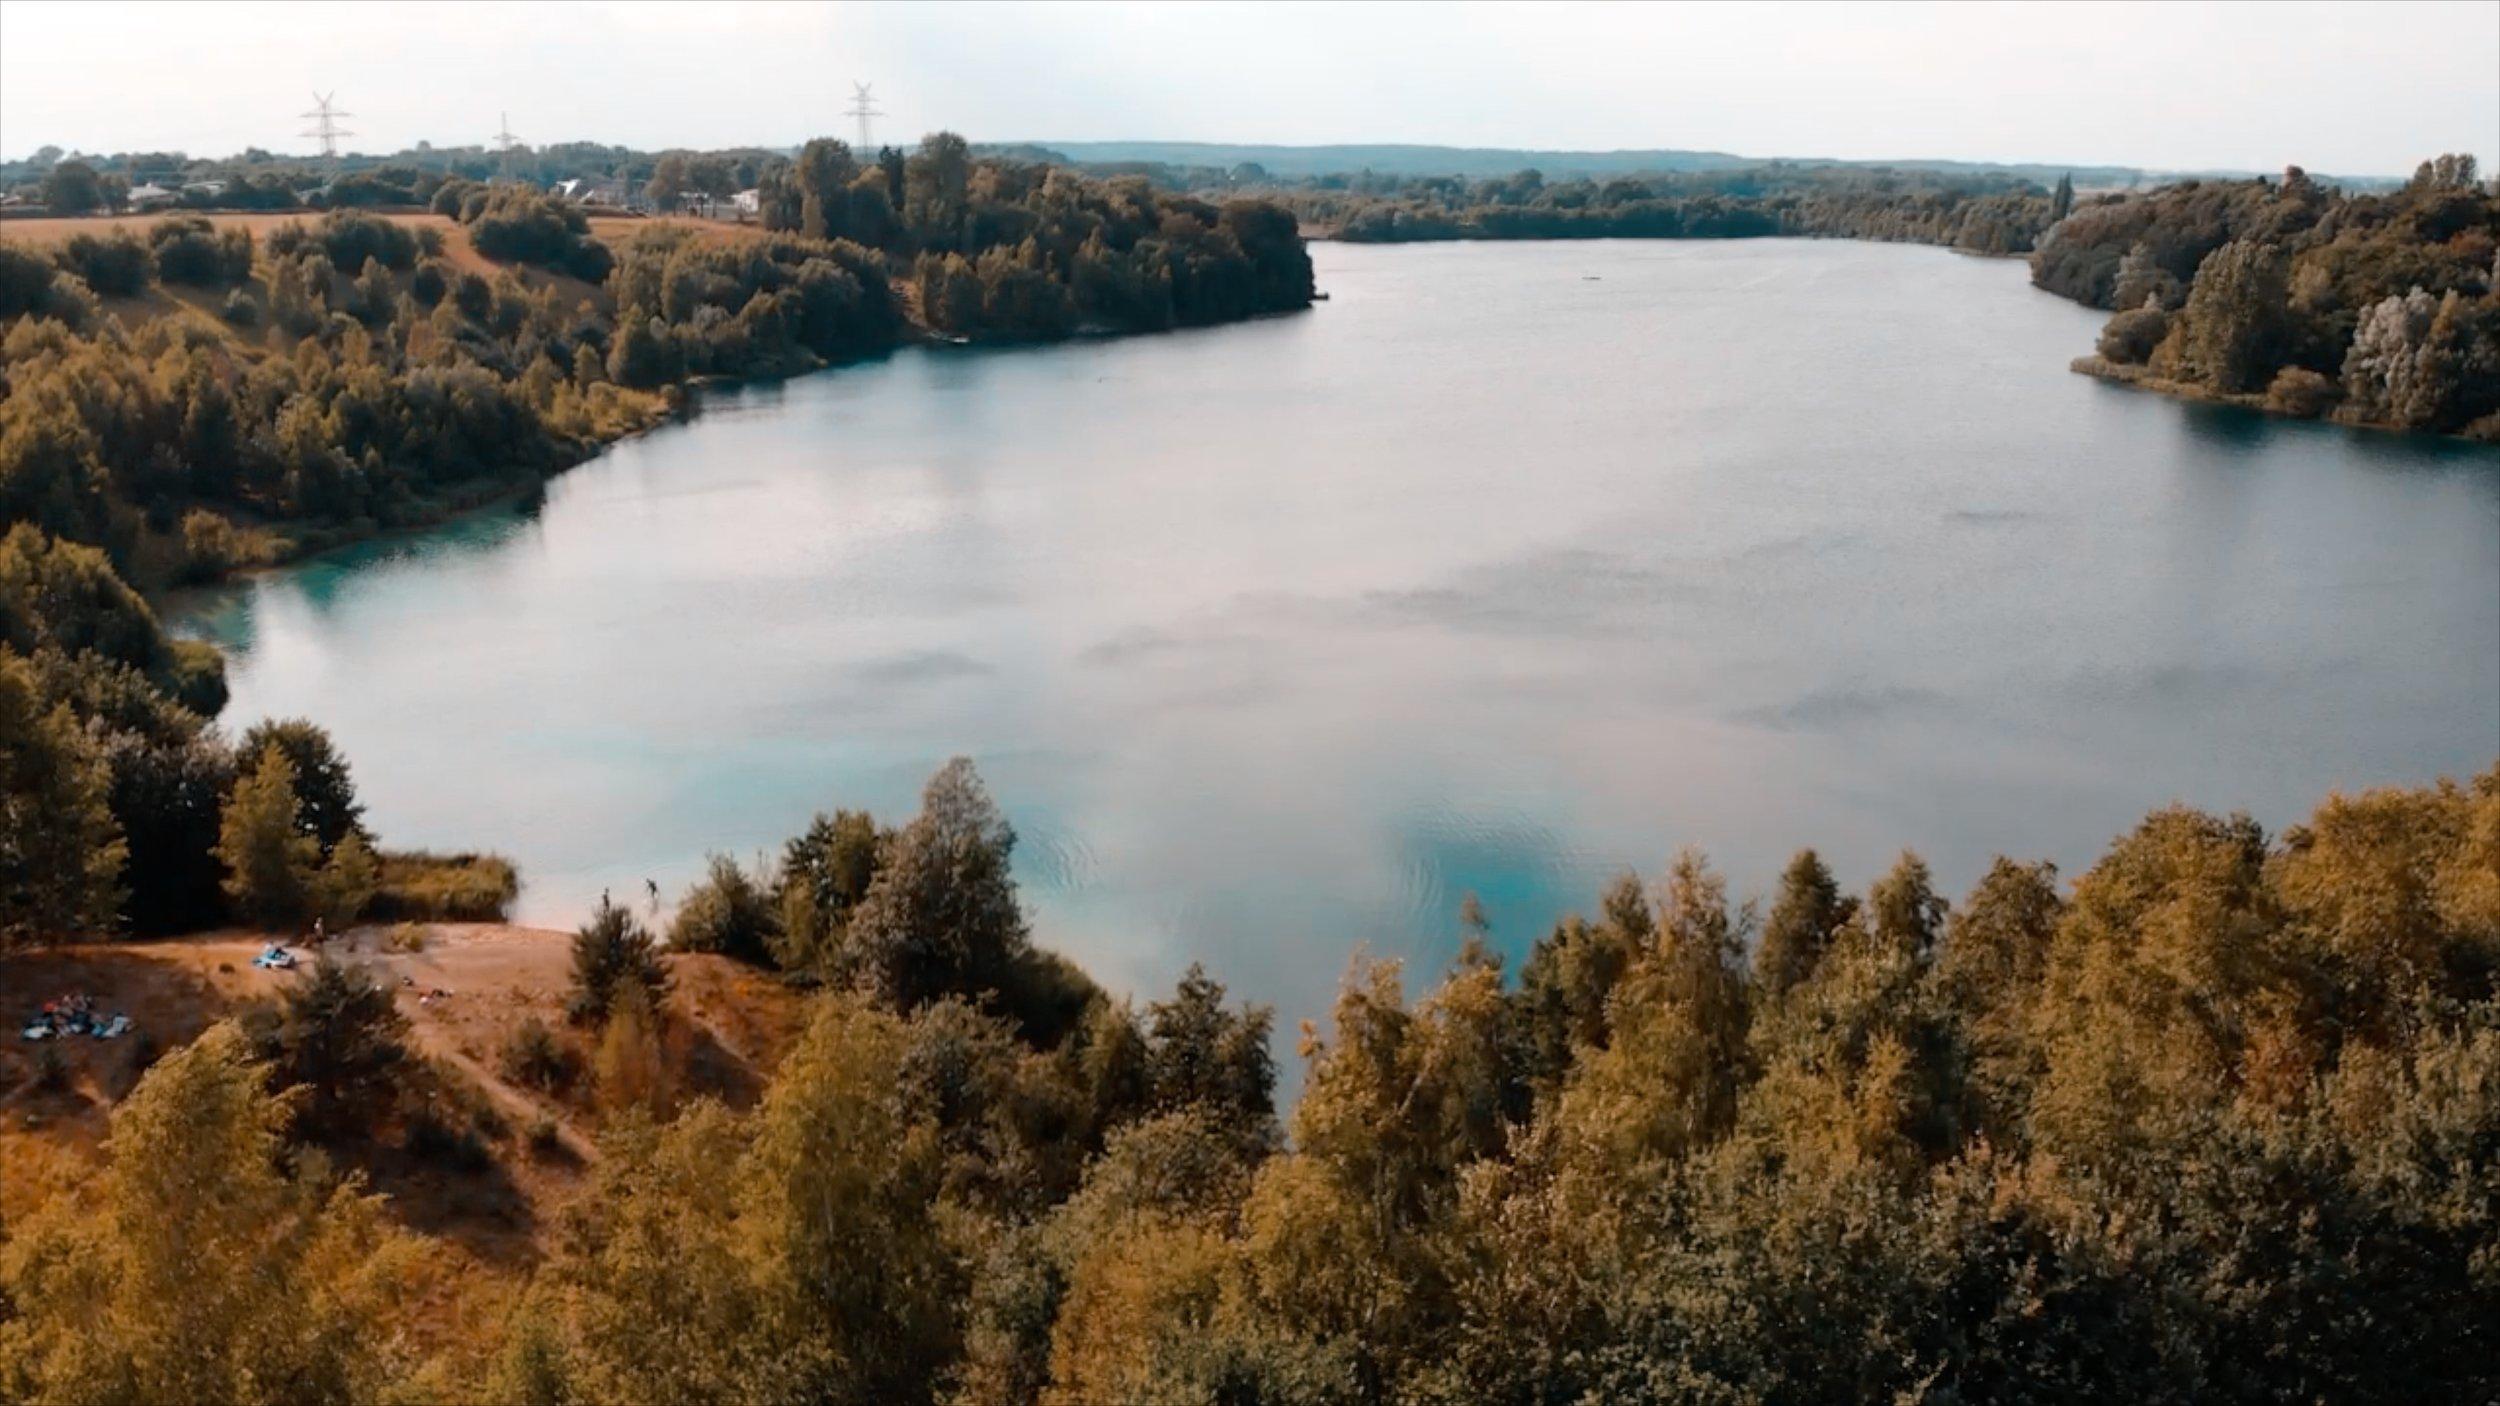 Lake Kreidesee in Hemmoor, beautiful lake right next to where I am from.